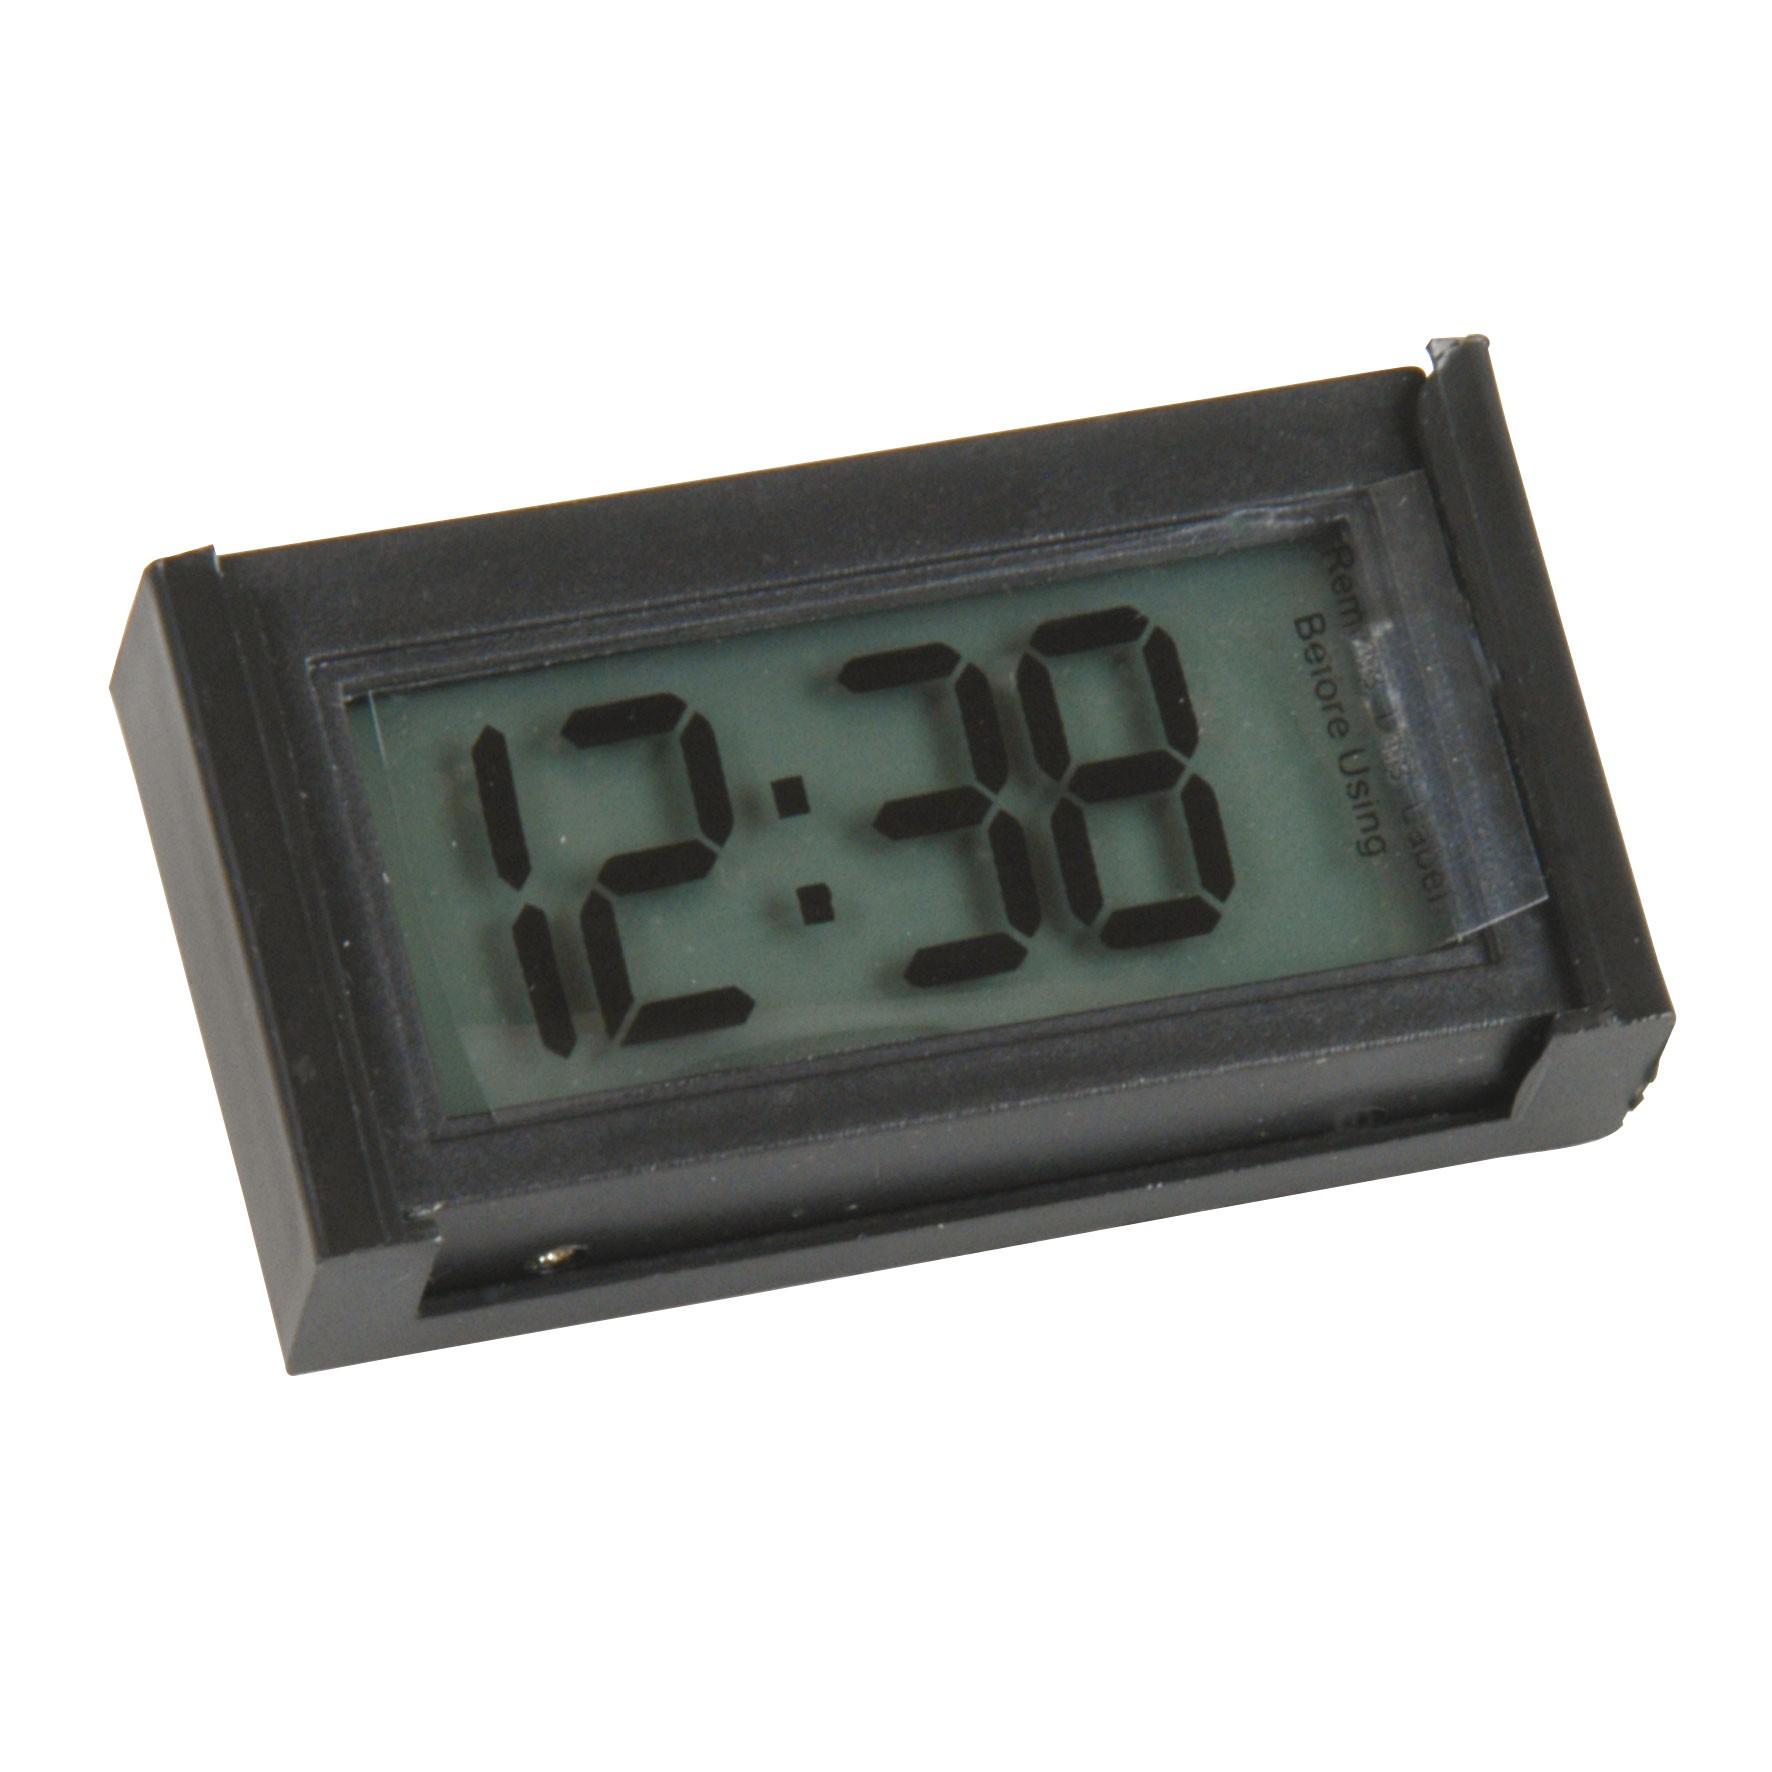 Unitec LCD Digital Uhr Bild 1